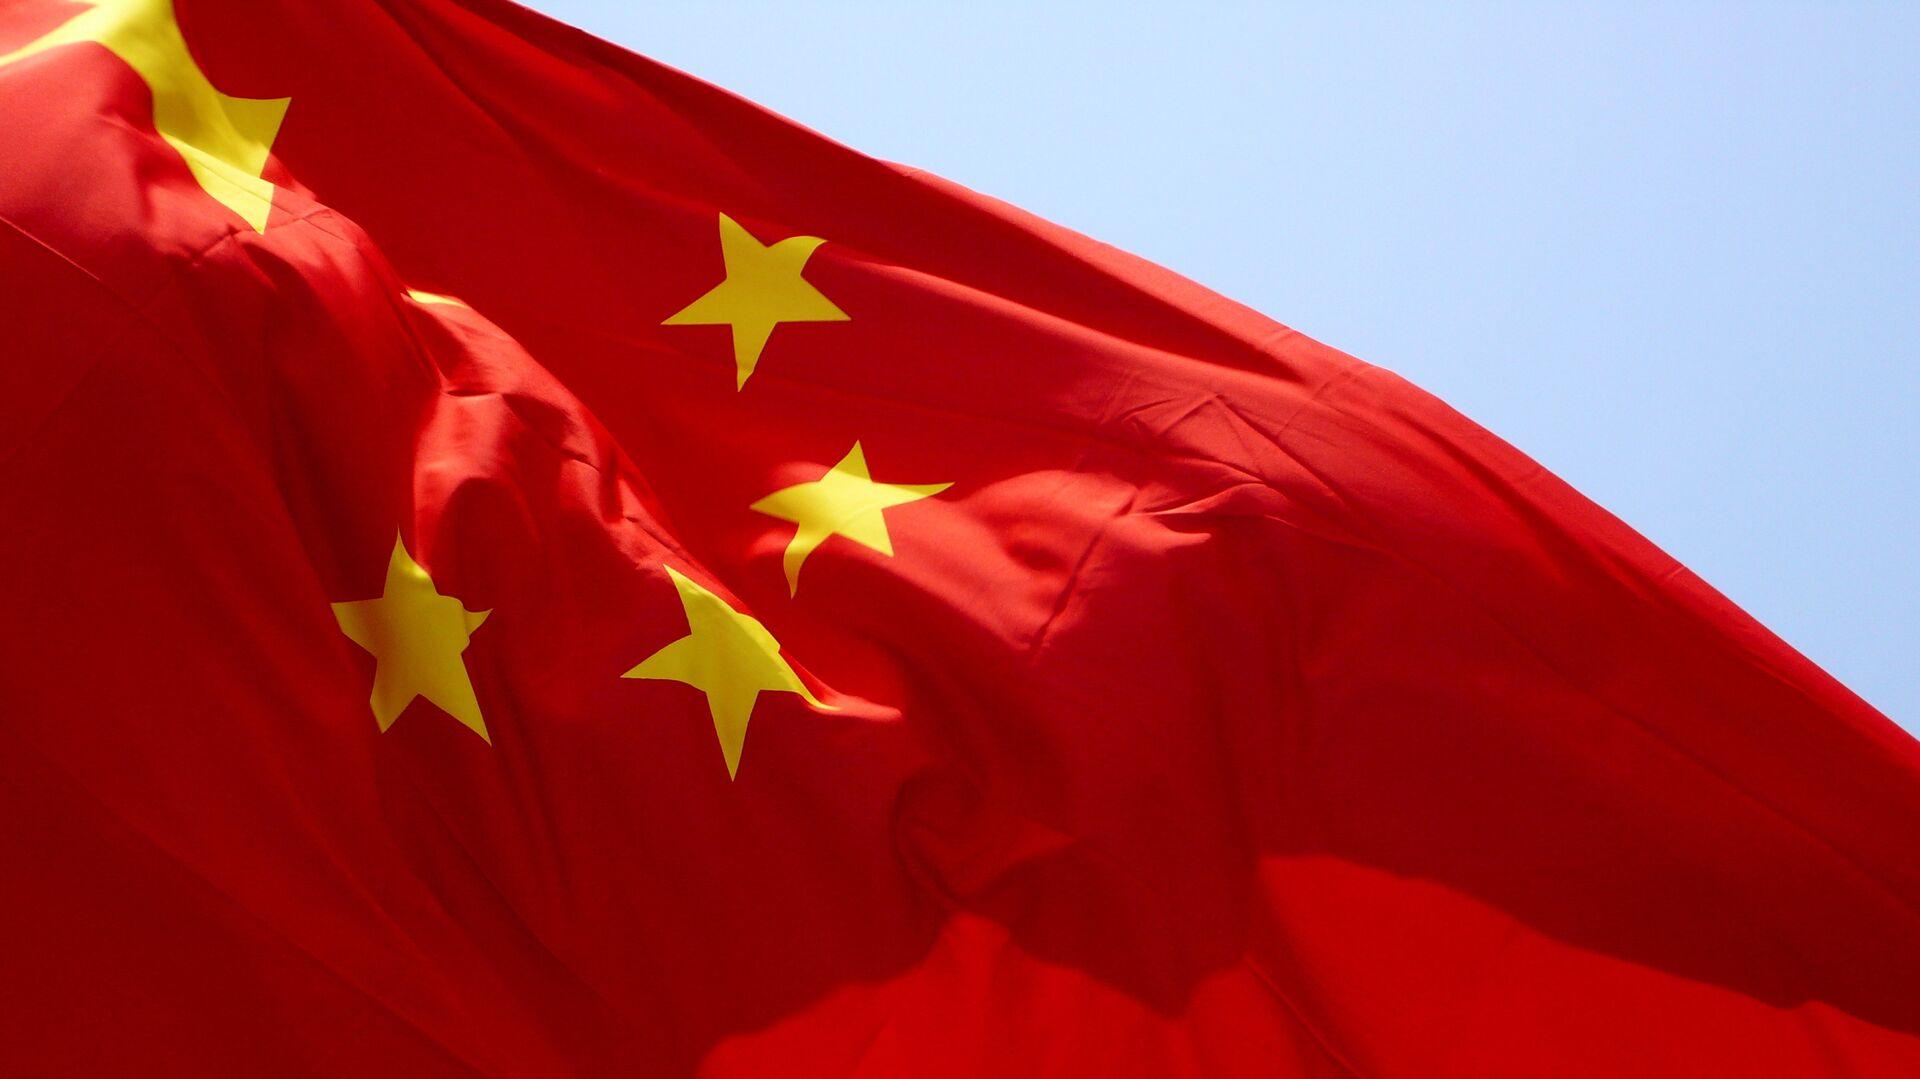 Bandera de China - Sputnik Mundo, 1920, 14.09.2021